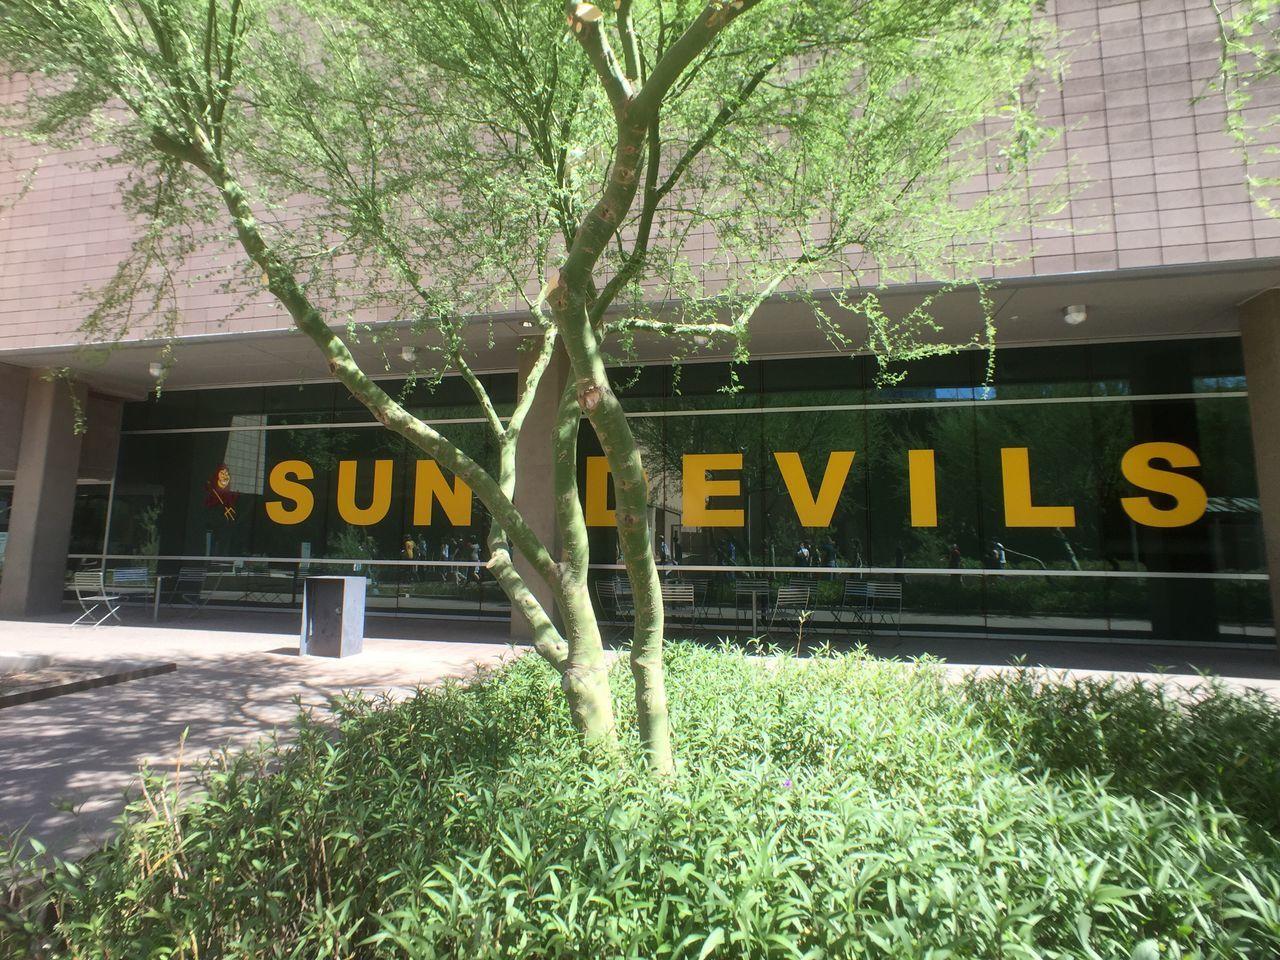 Sun Devils ASU Arizona State University